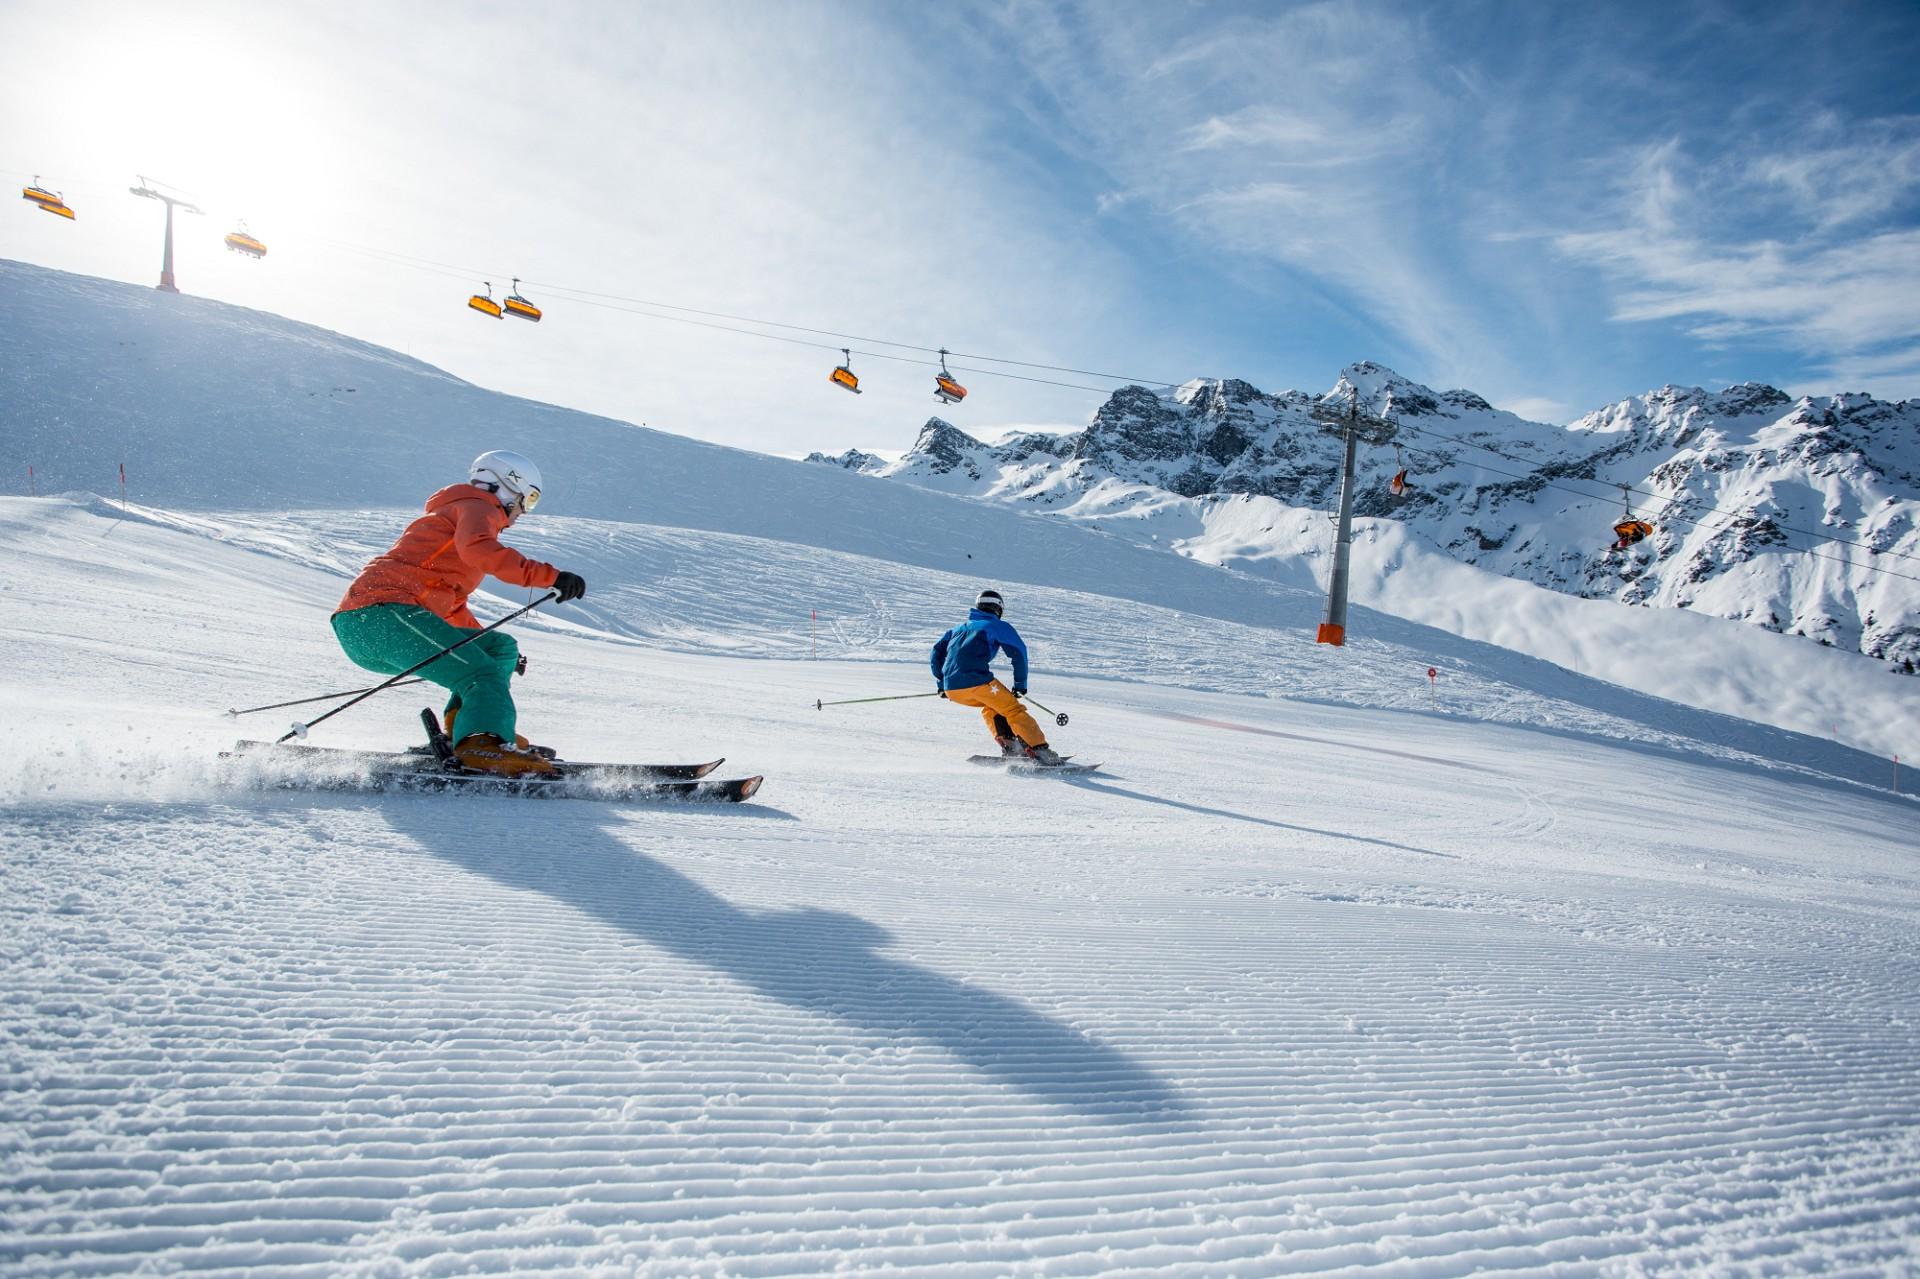 Skifahren im Montafon (c) Daniel Zangerl - Montafon Tourismus GmbH, Schruns